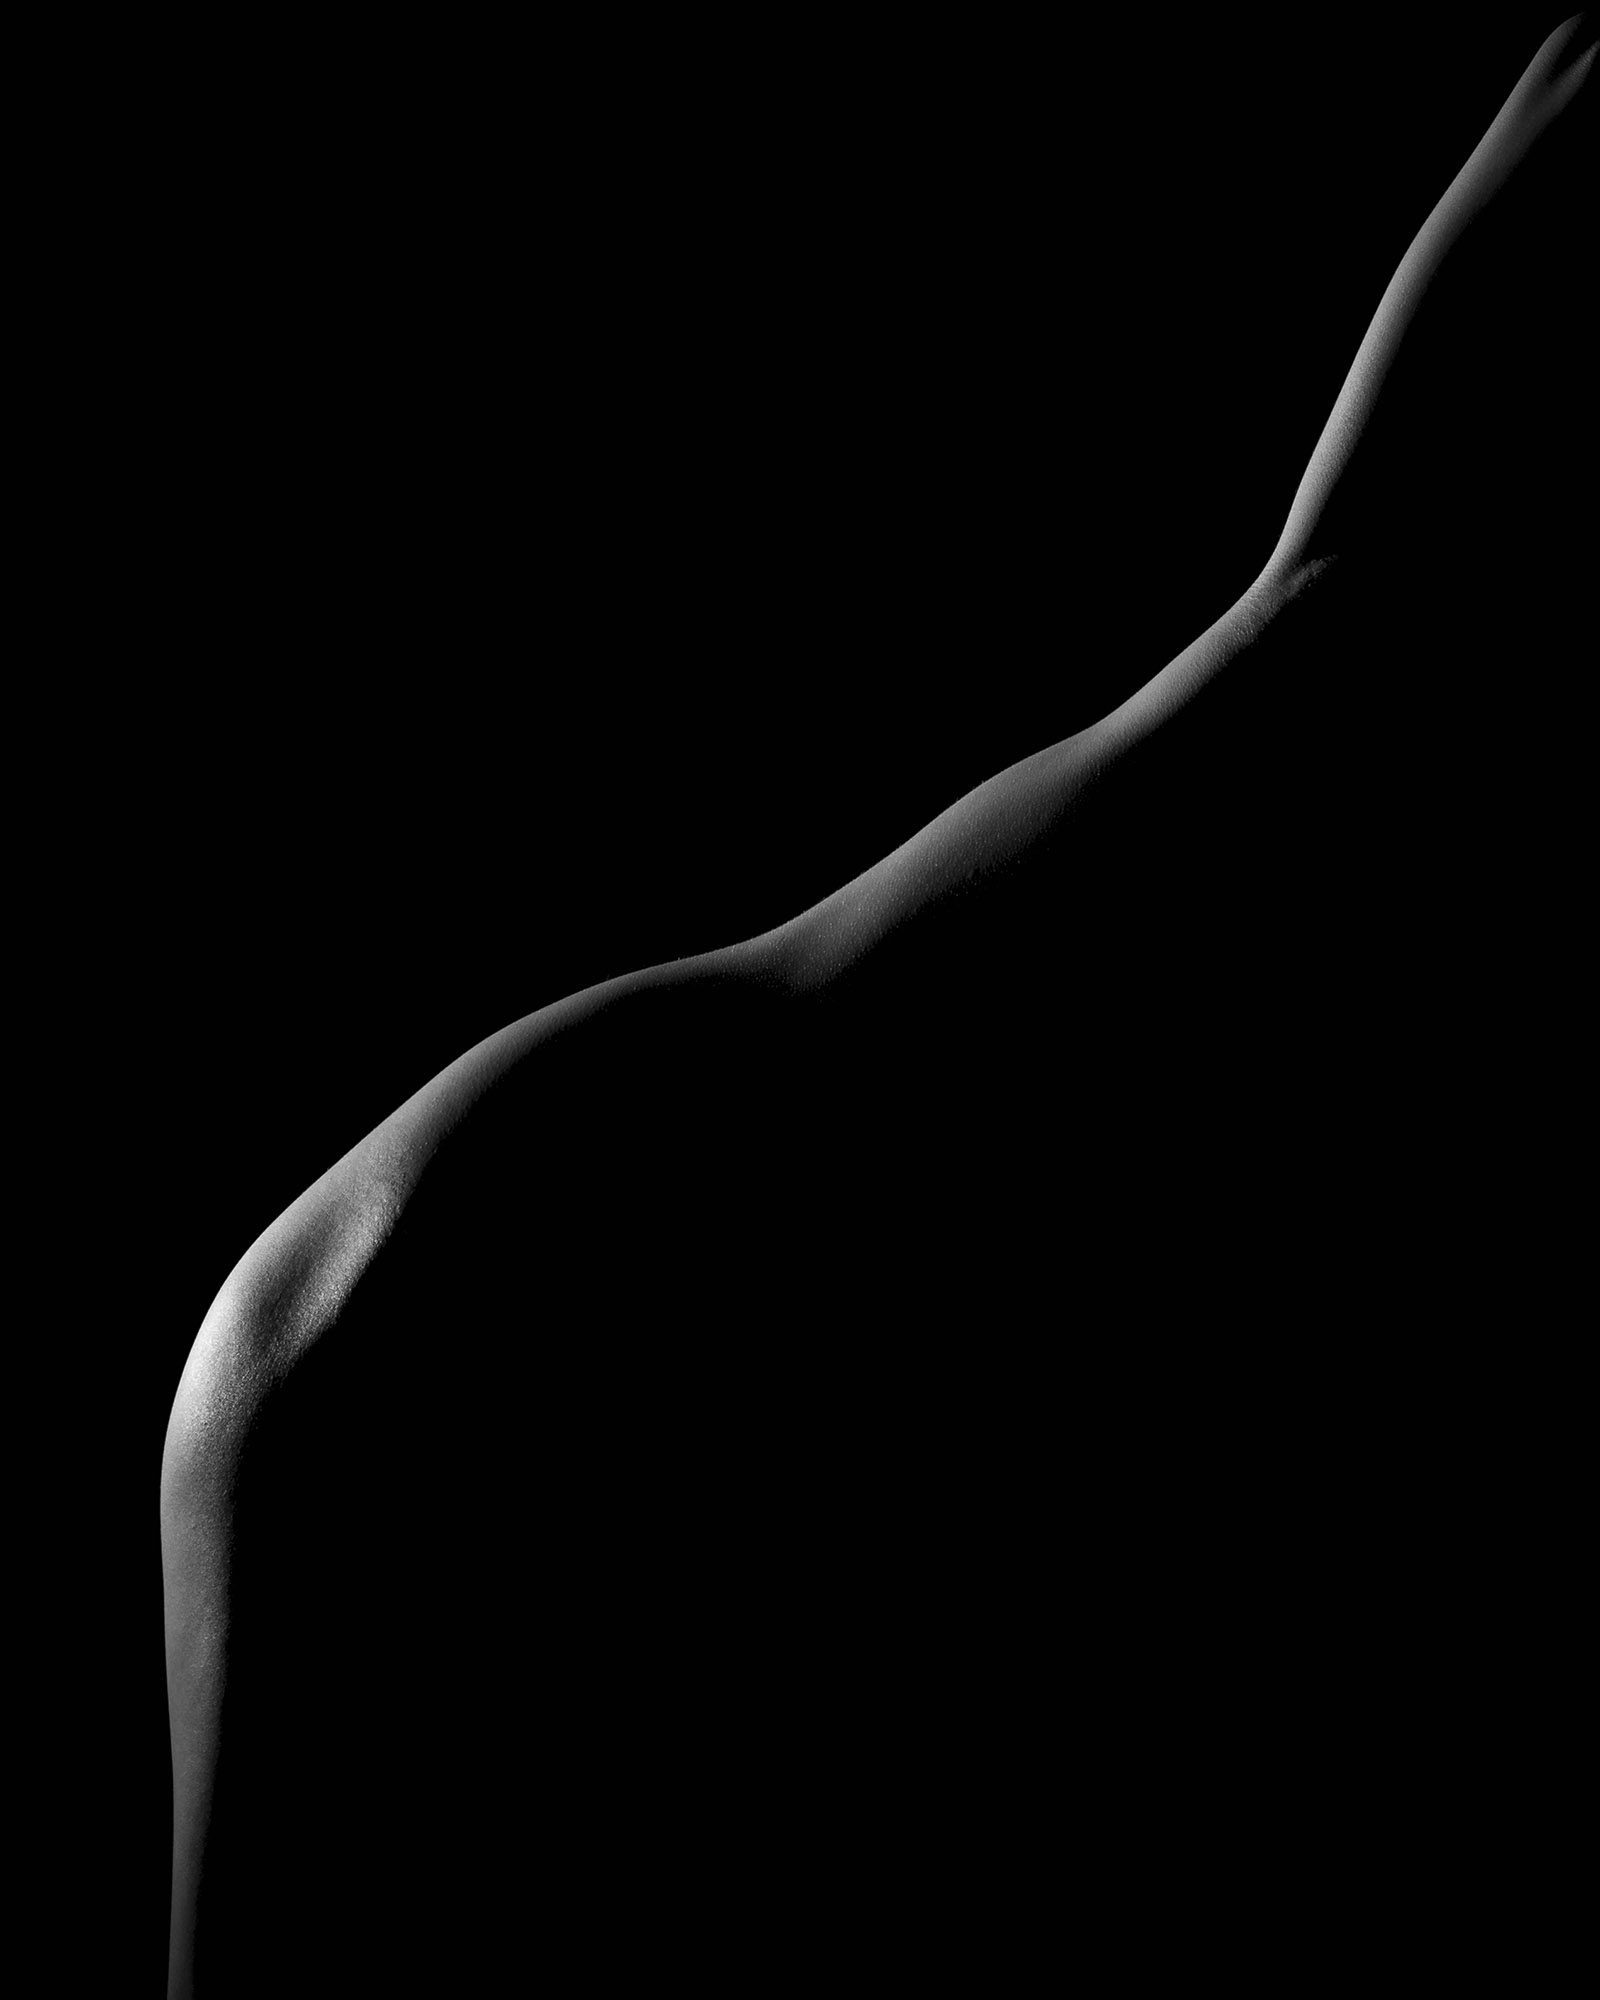 Amanda Adrienne Nude nude — fitness & bodybuilding photography | mark ruddick